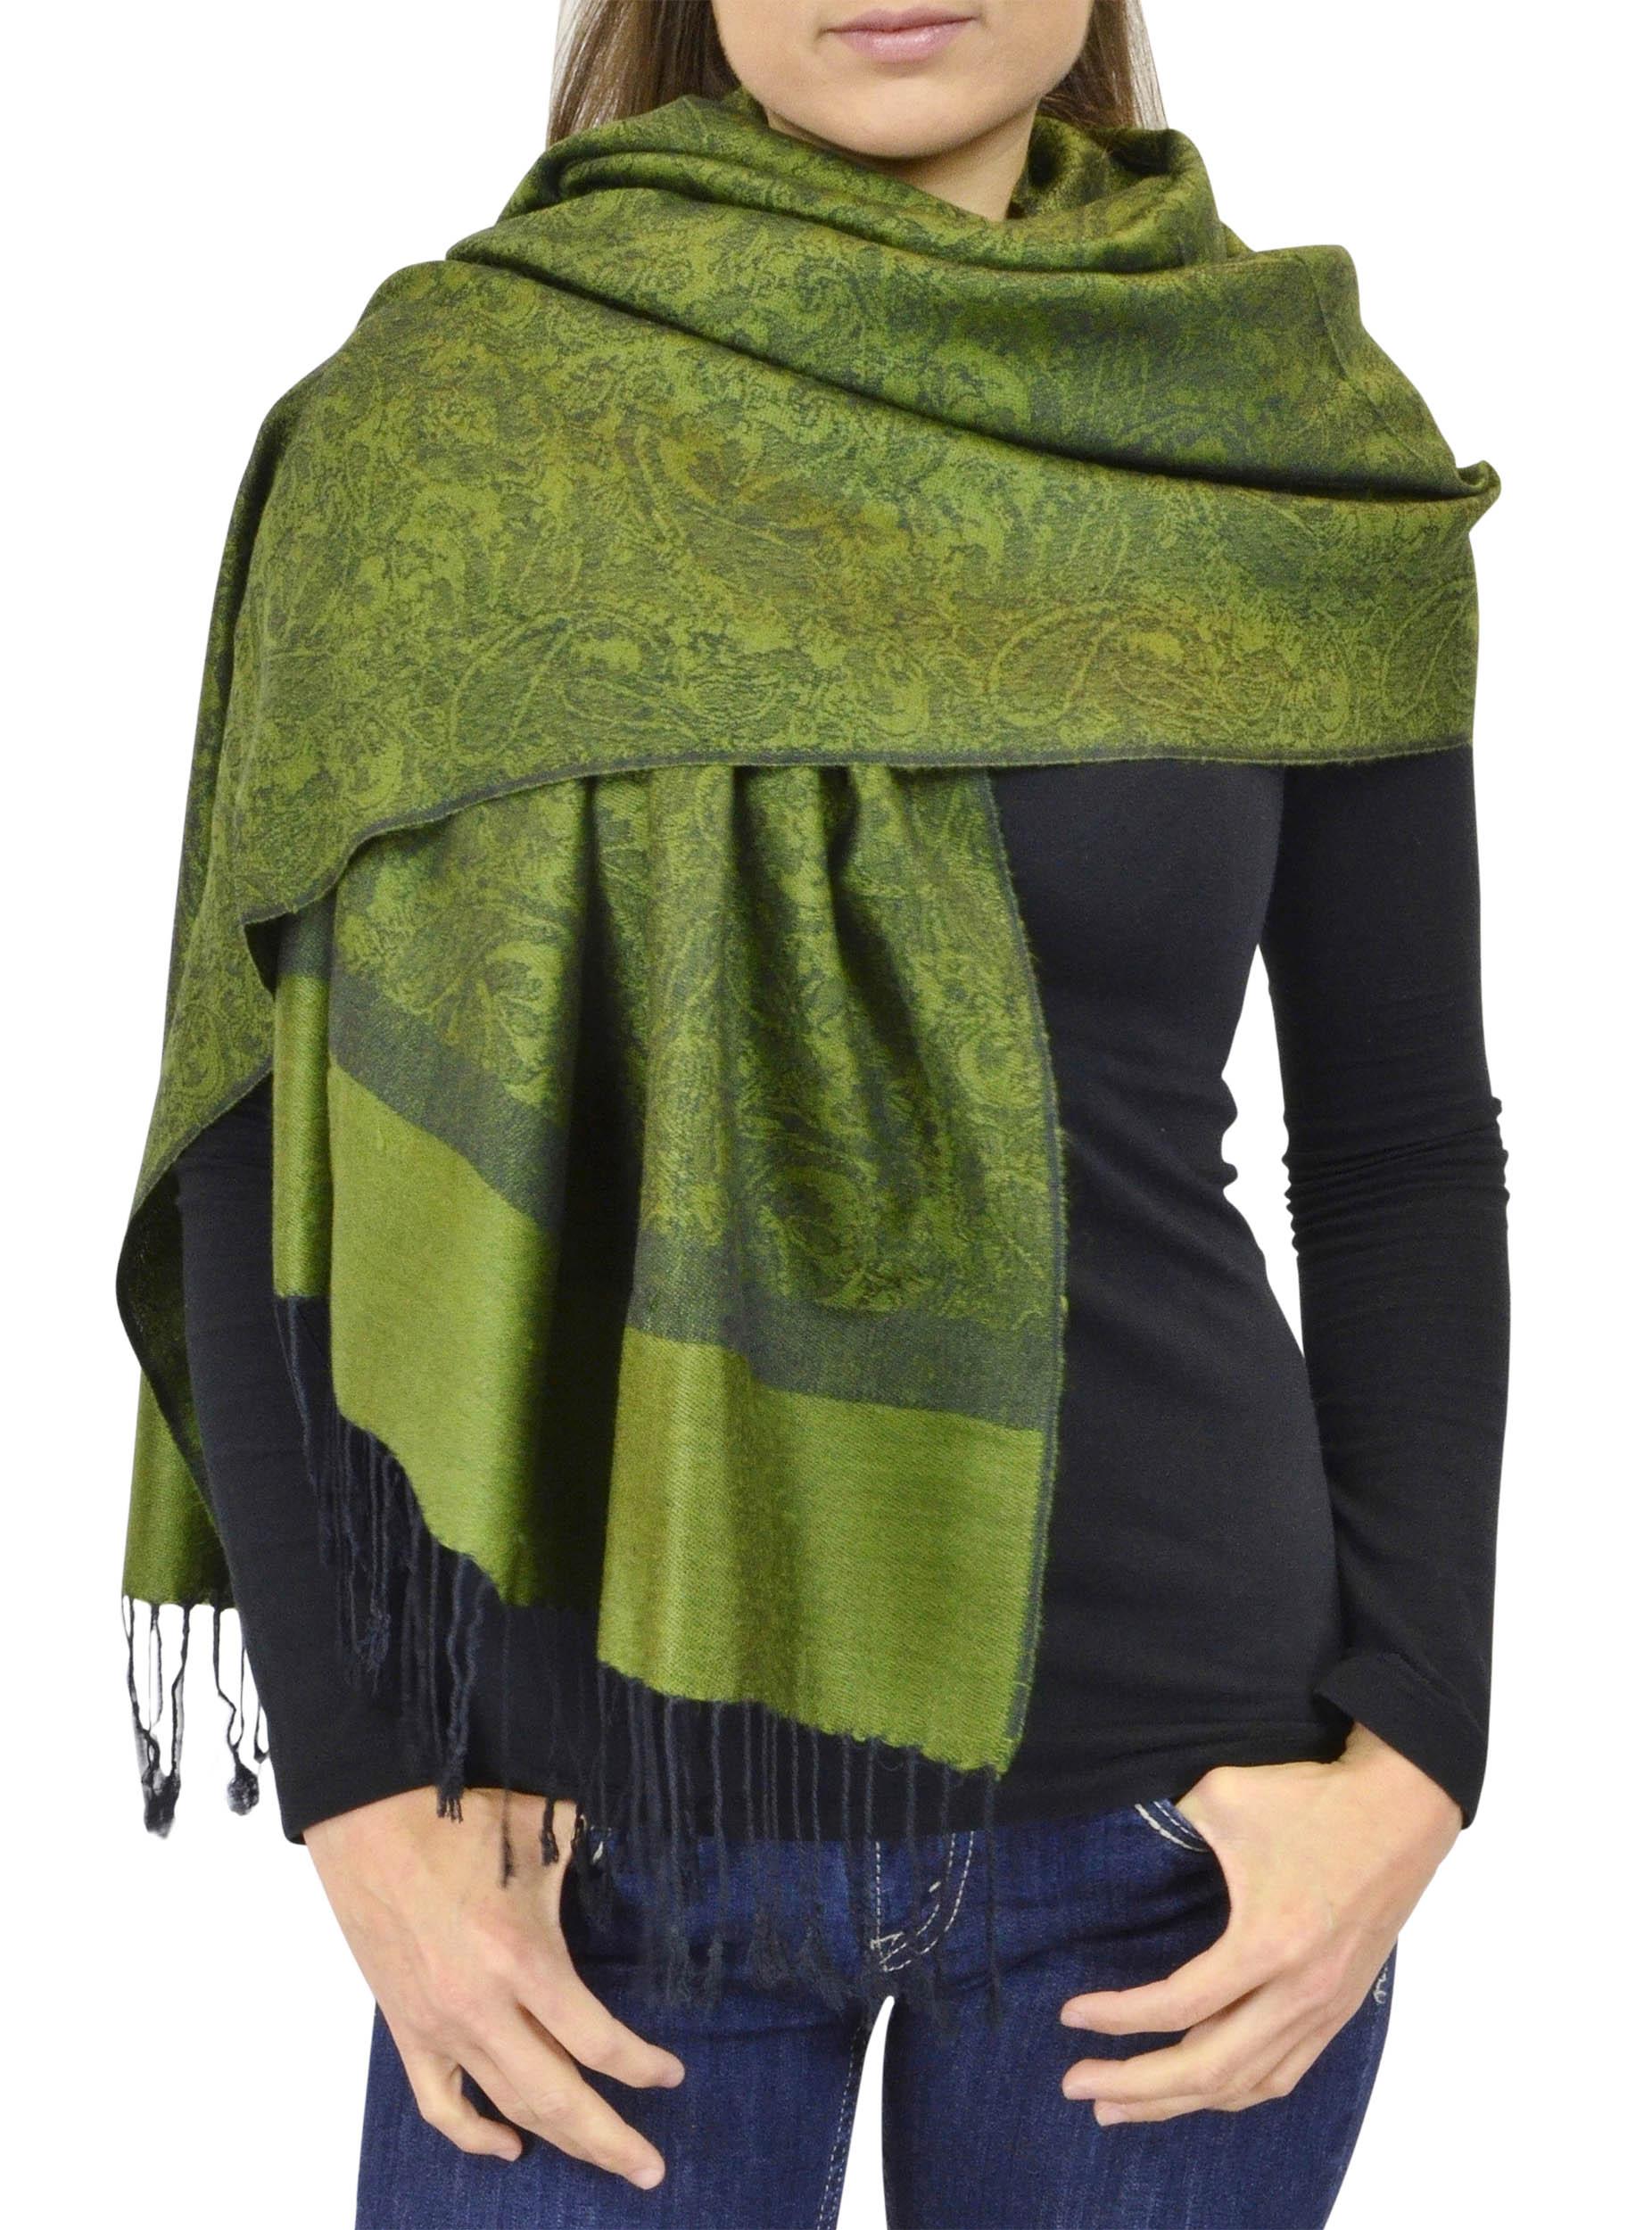 Belle Donne Women's Paisley Pashmina Shawl Wrap Scarf - Dark Green